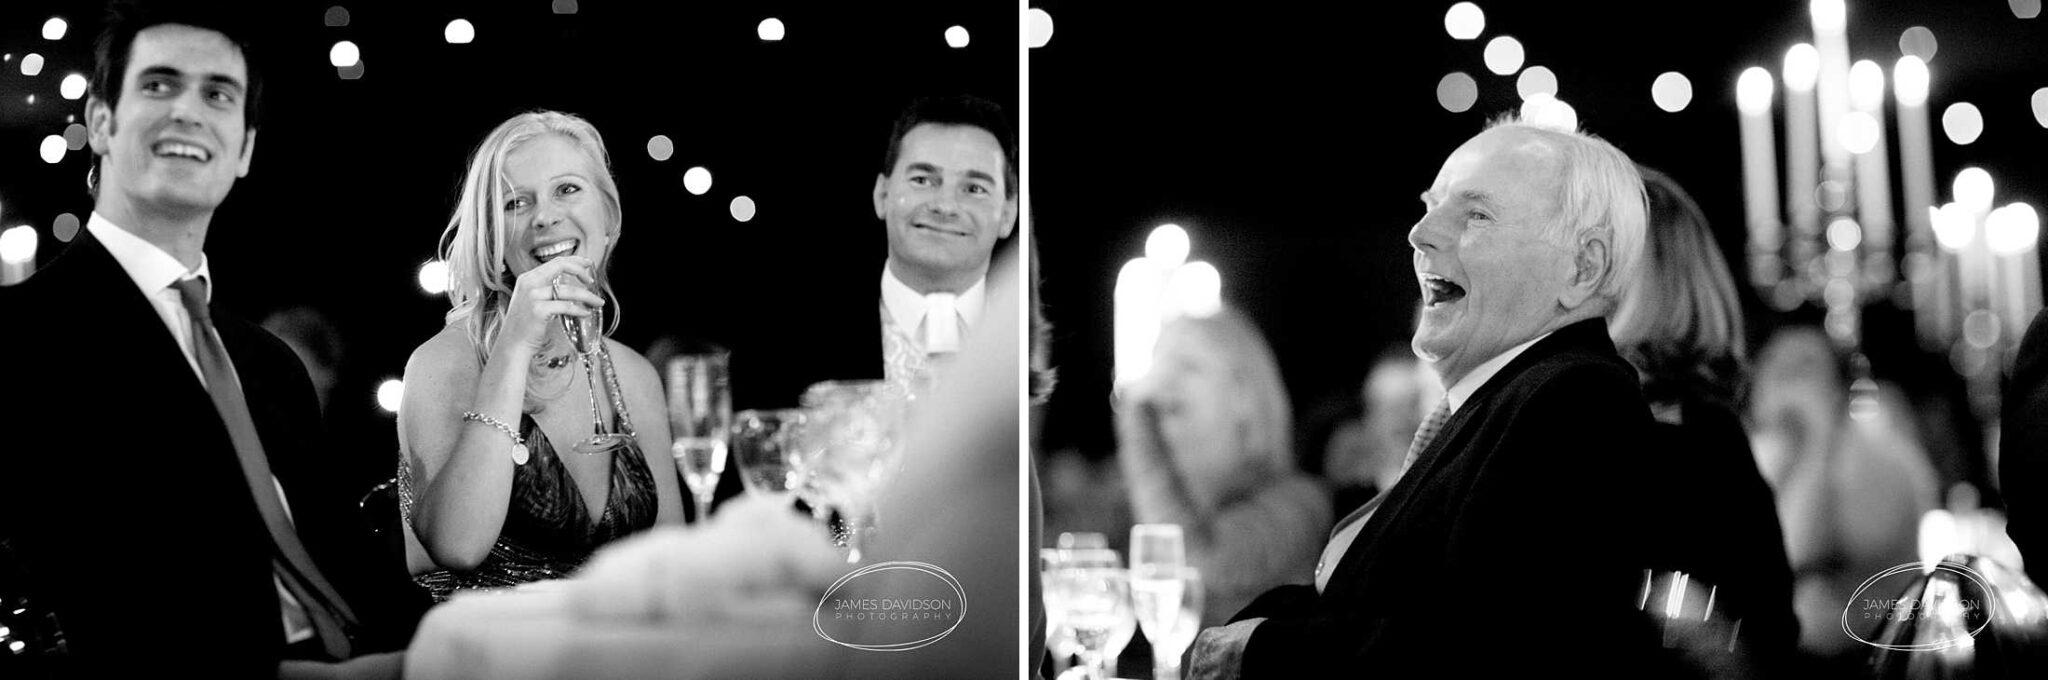 huddersfield-wedding-photography-037